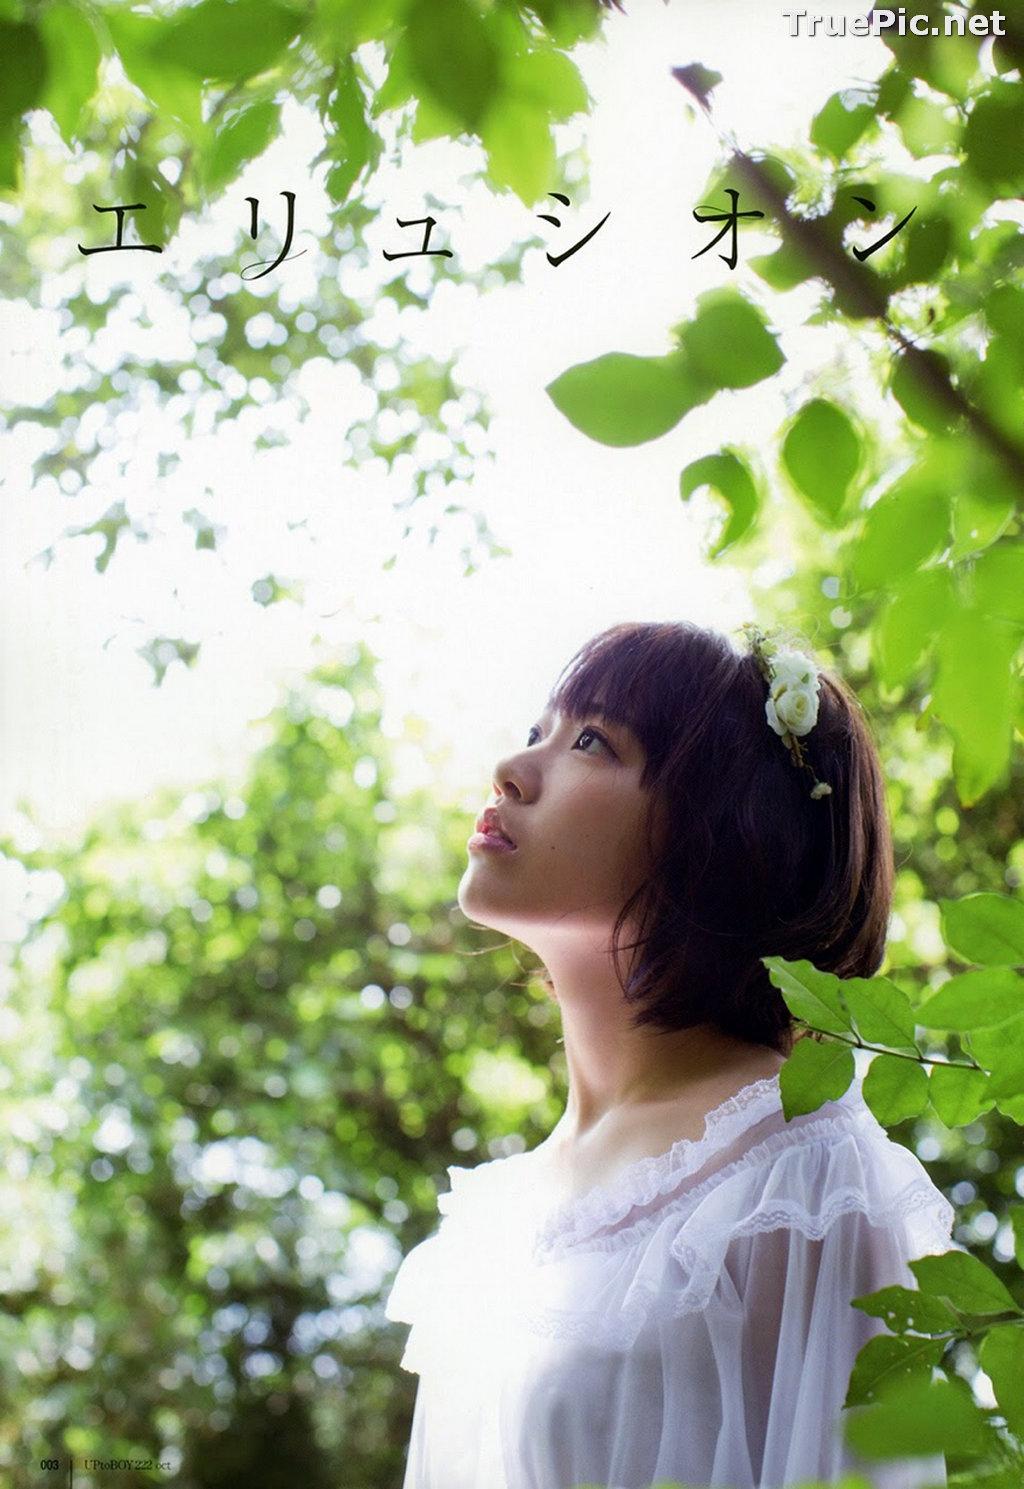 Image Japanese Singer and Actress - Sakura Miyawaki (宮脇咲良) - Sexy Picture Collection 2021 - TruePic.net - Picture-10